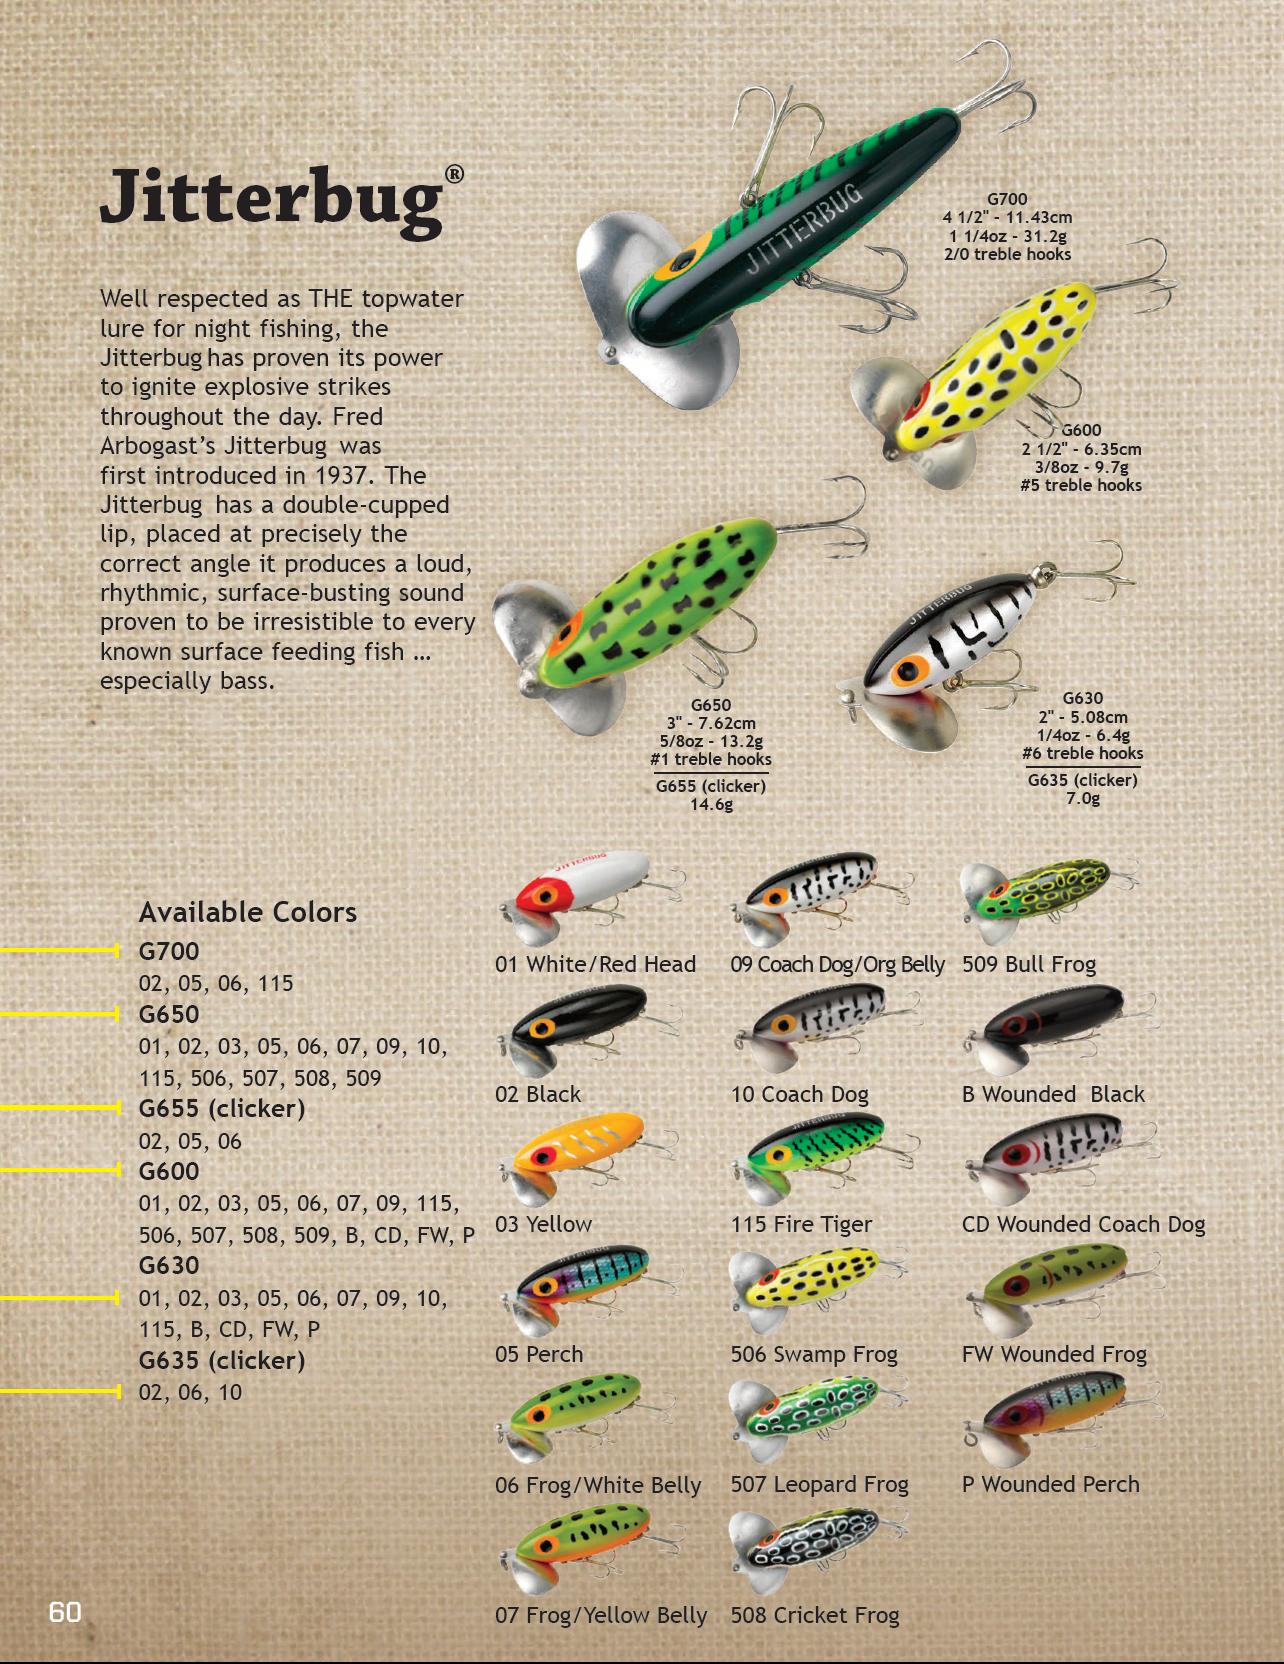 Arbogast jitterbug 2017 color chart fishing lure color charts bass fishing lures arbogast jitterbug 2017 color chart nvjuhfo Gallery